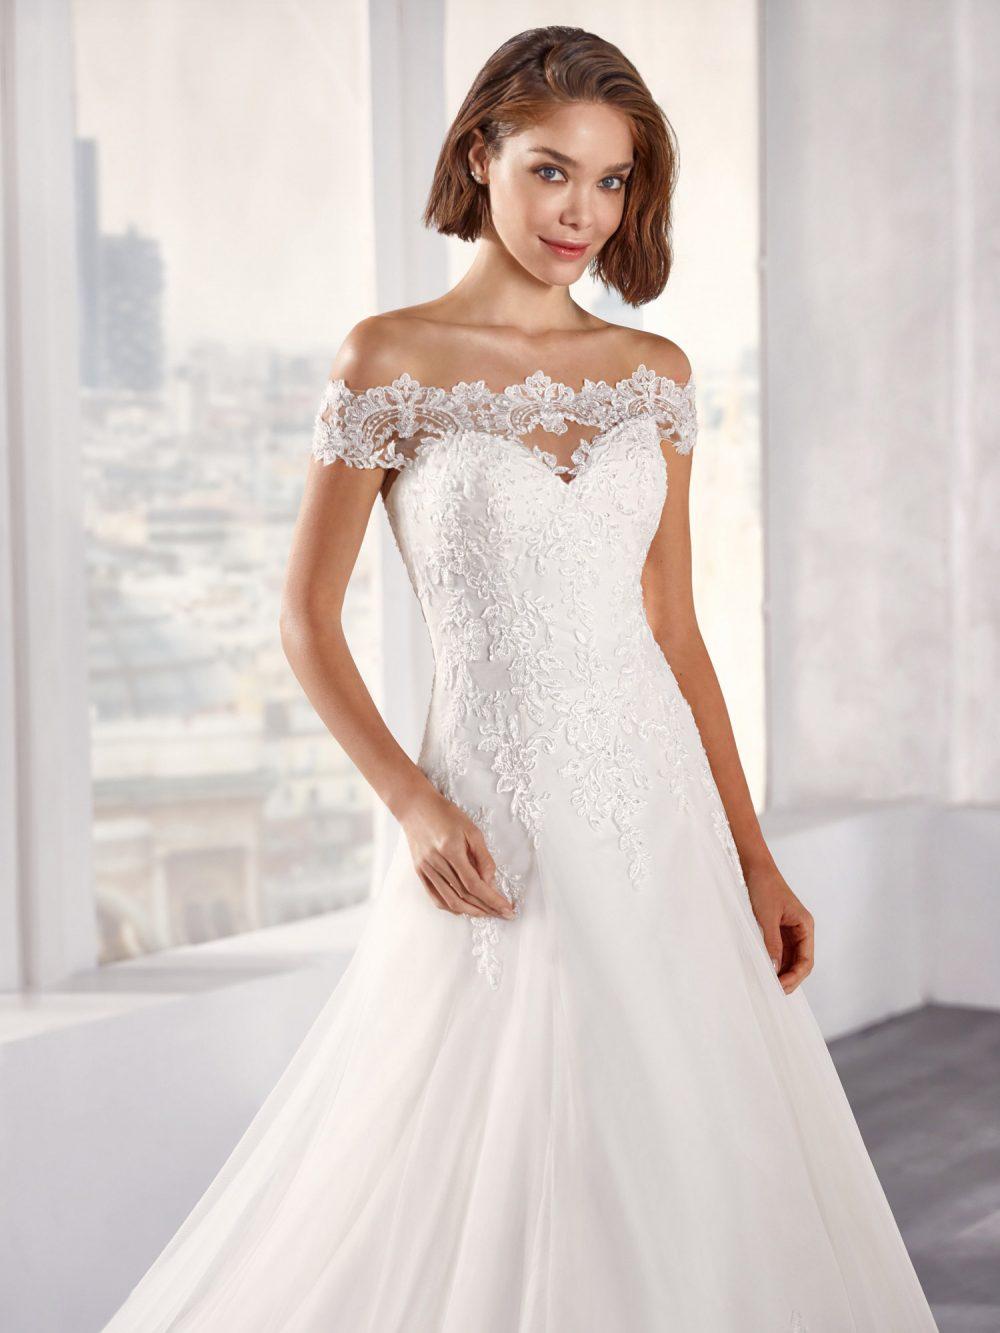 Mariages: abito da sposa Jolies 2021 a Vicenza, Verona, Padova, Veneto JO12160